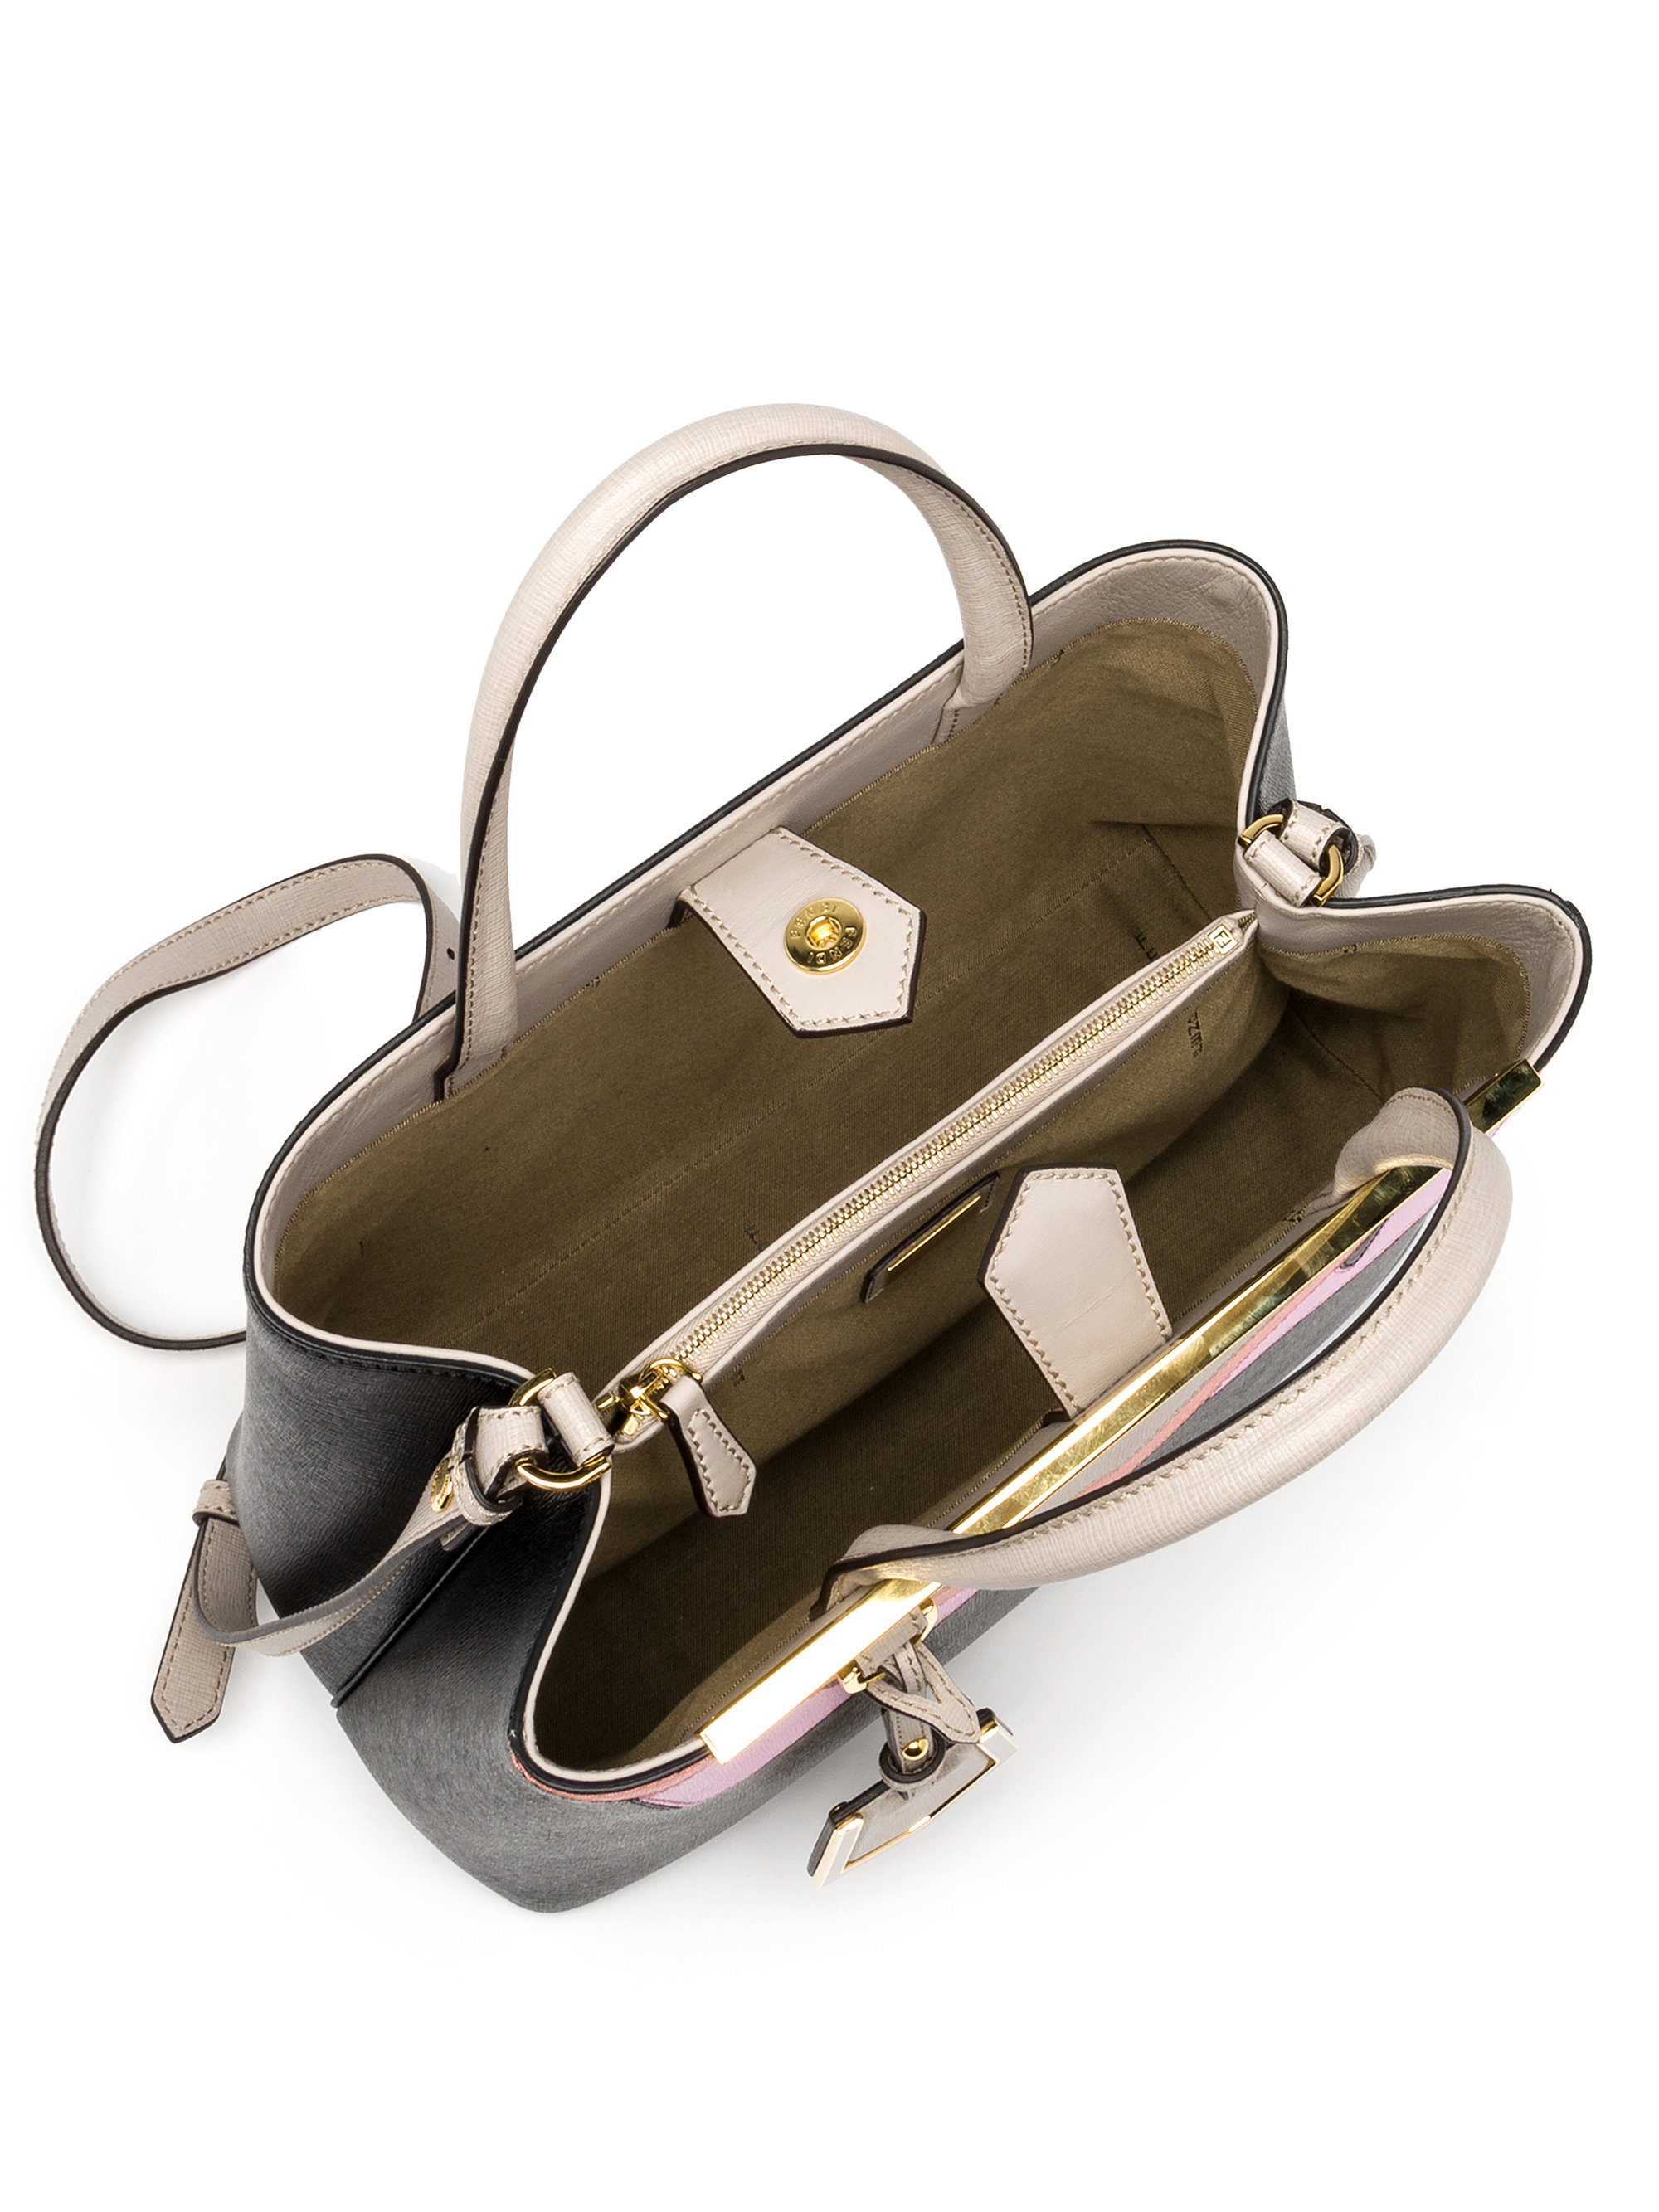 best replica chloe classic 5662 handbag lambskin